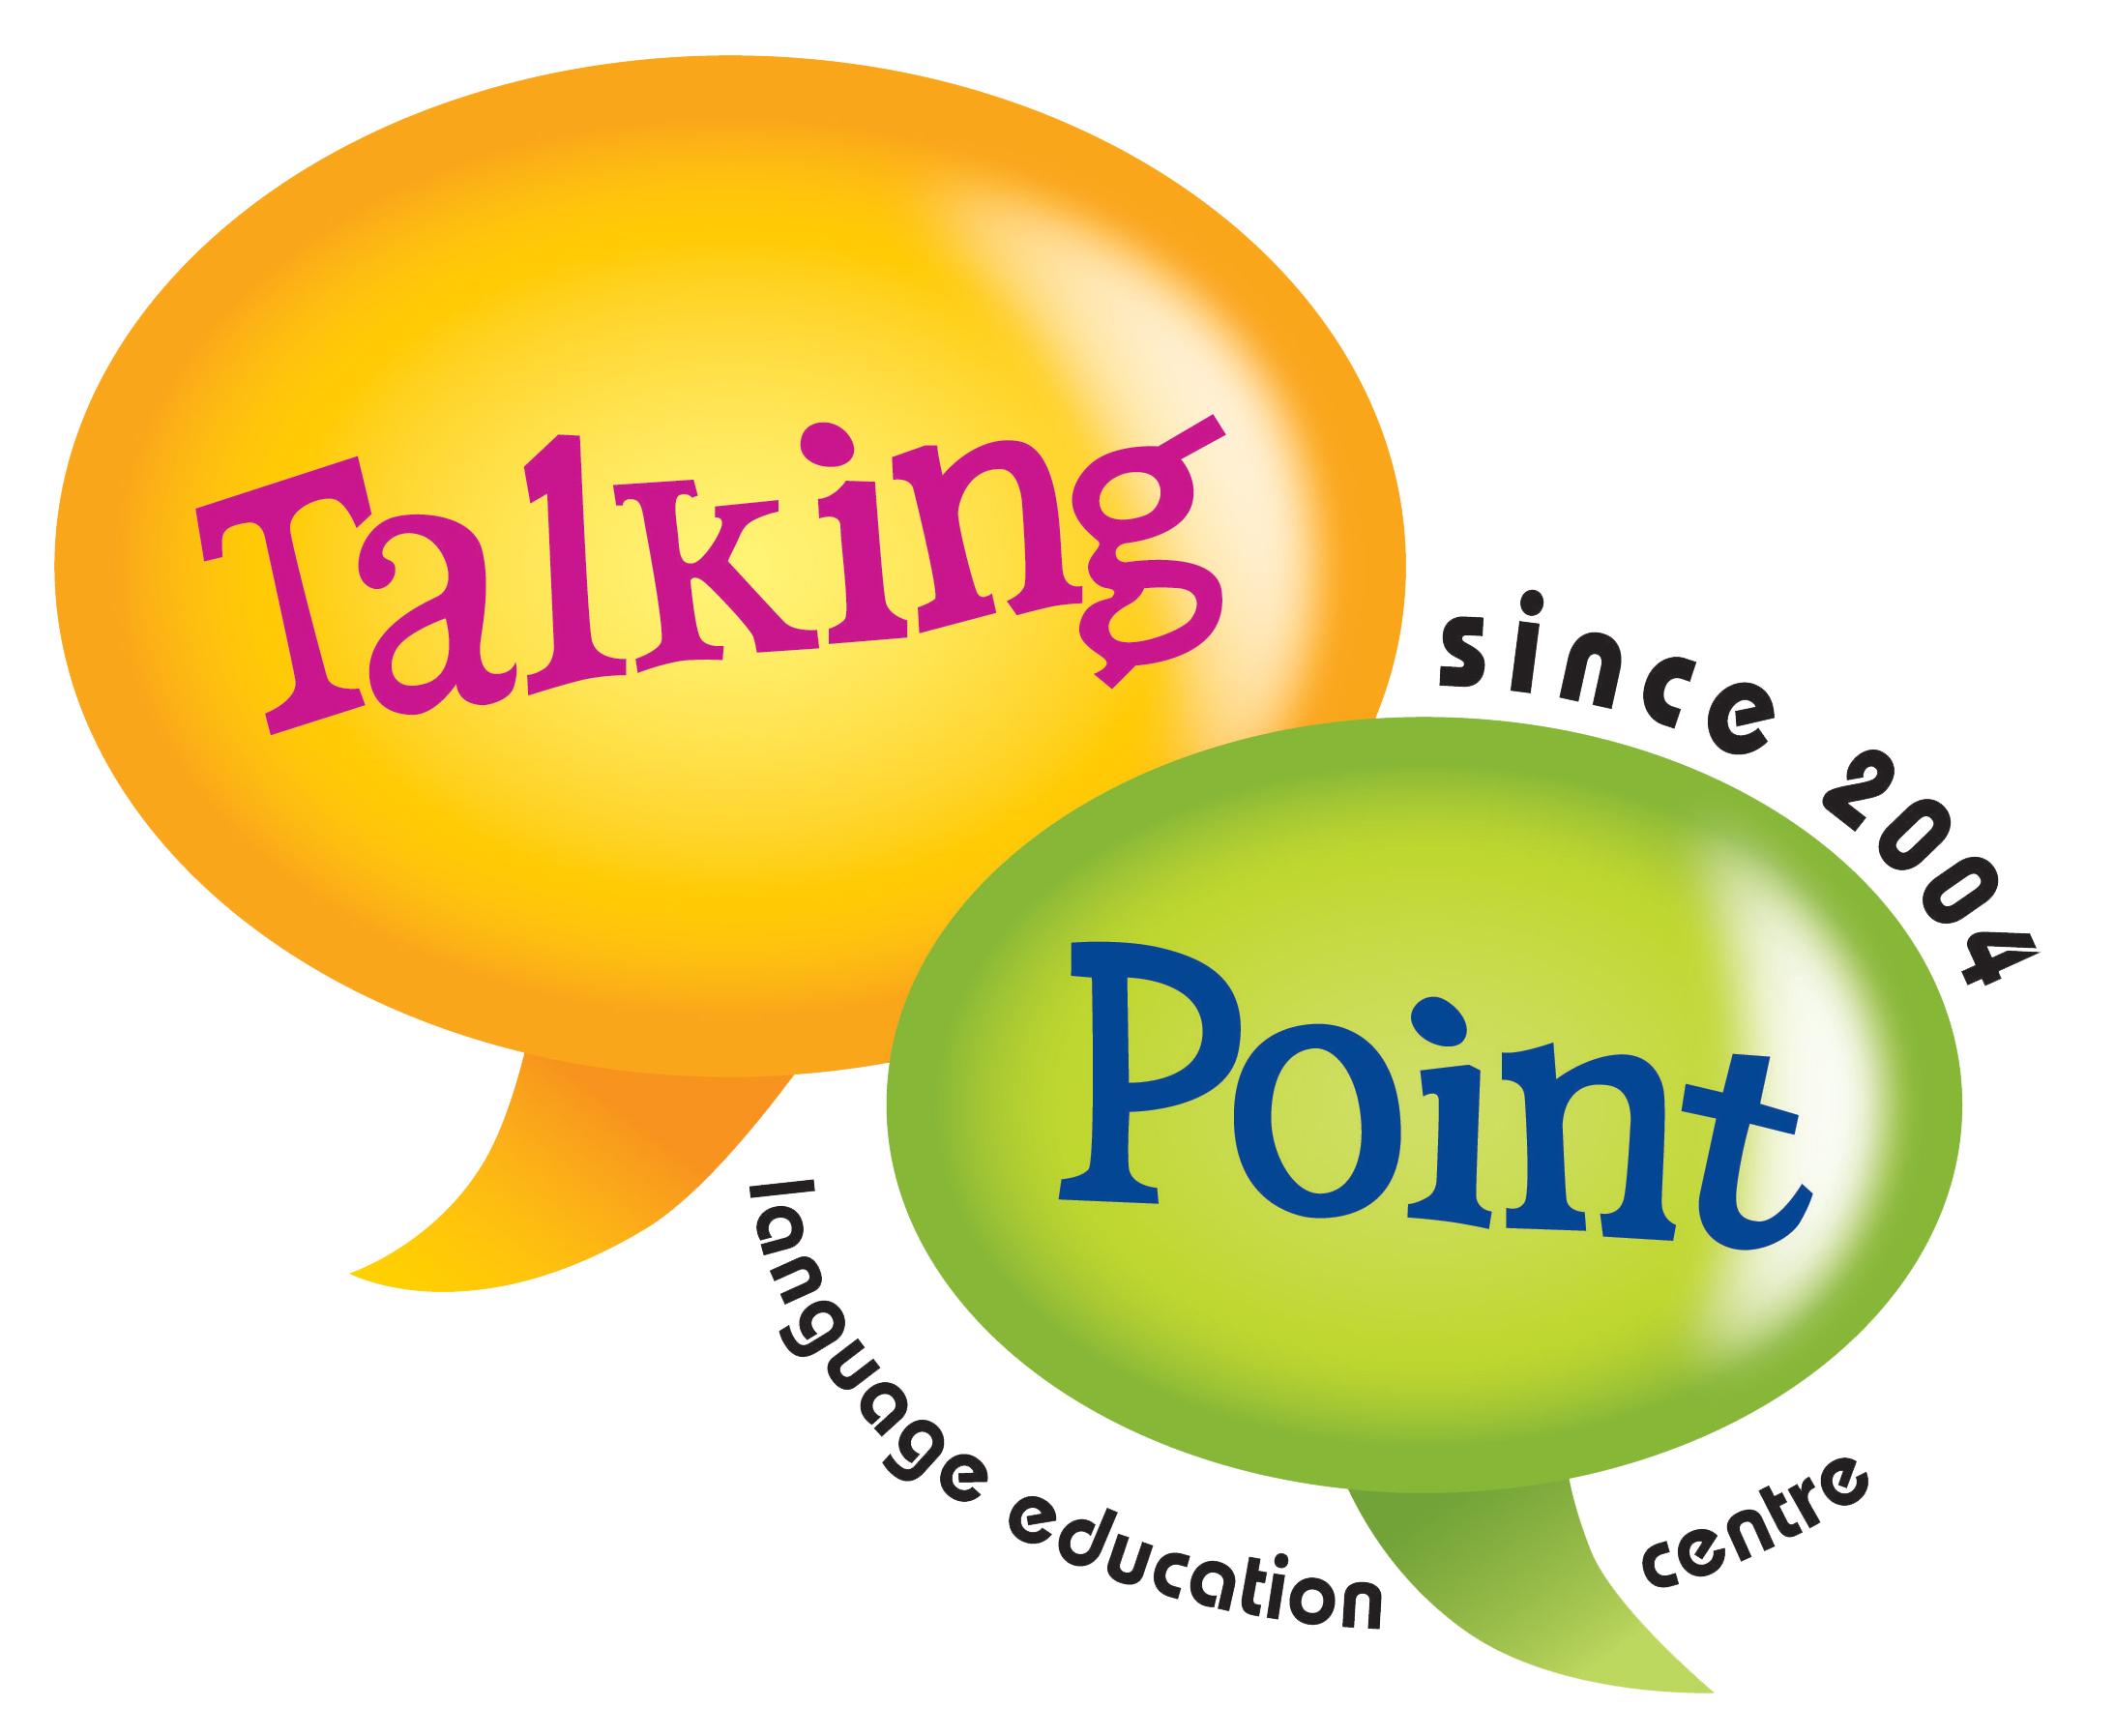 Talking Point Language Education Centre